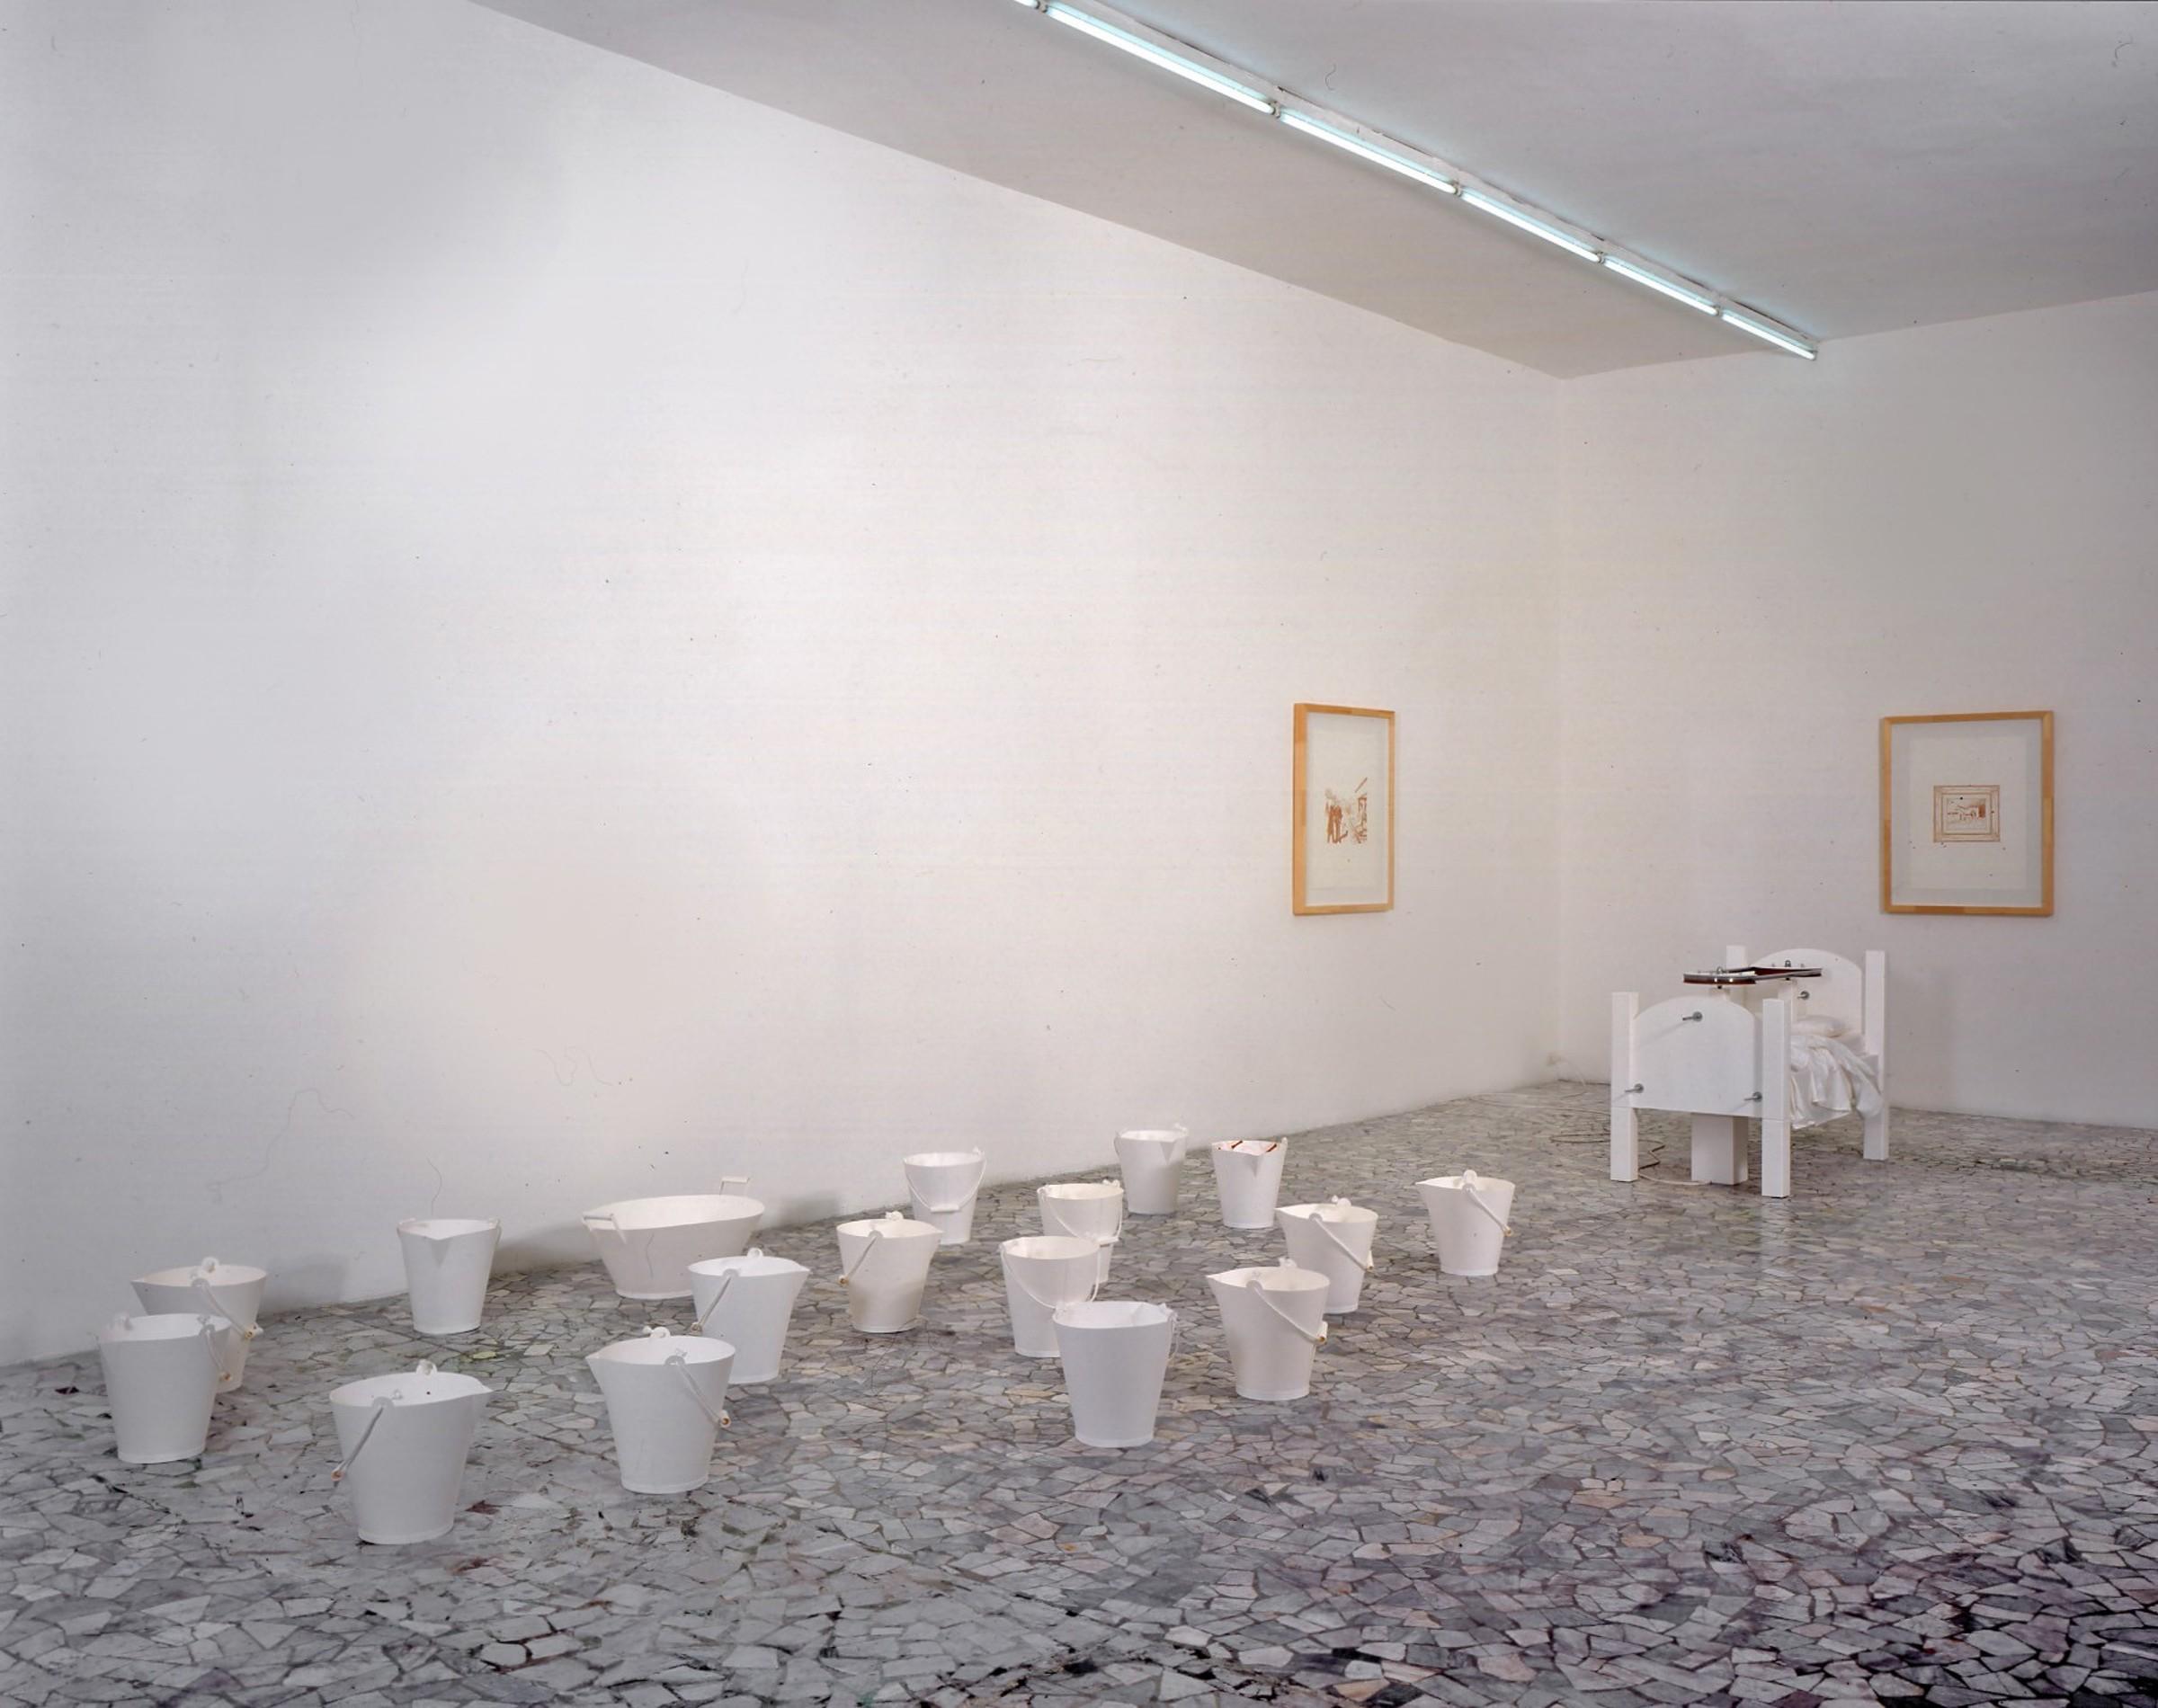 Baruffa in galleria